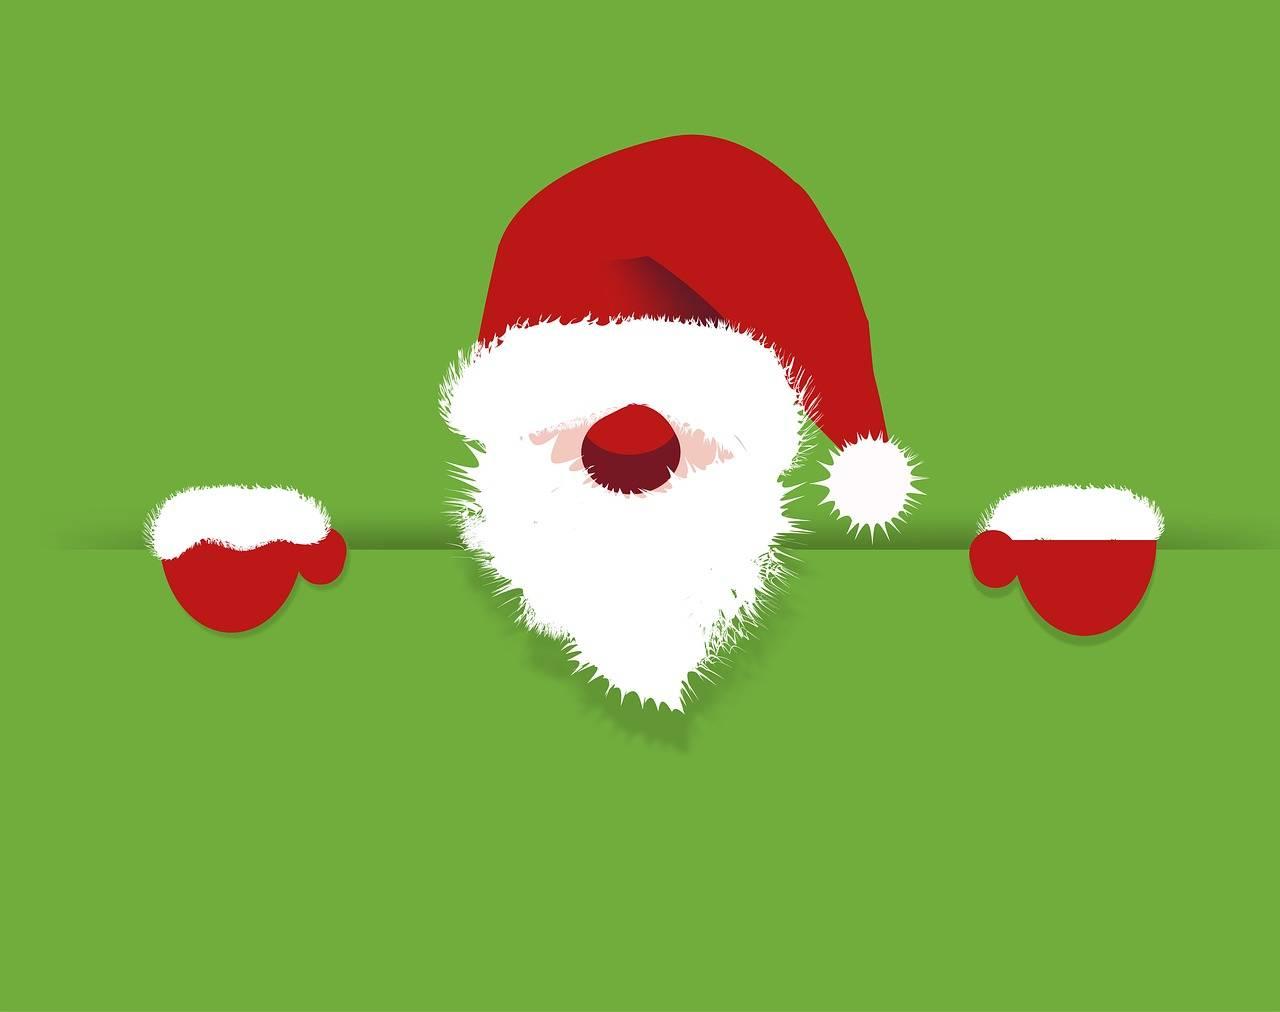 Frasi Originali Auguri Natale.Frasi Auguri Di Natale Via Whatsapp Citazioni Aforismi E Idee Originali